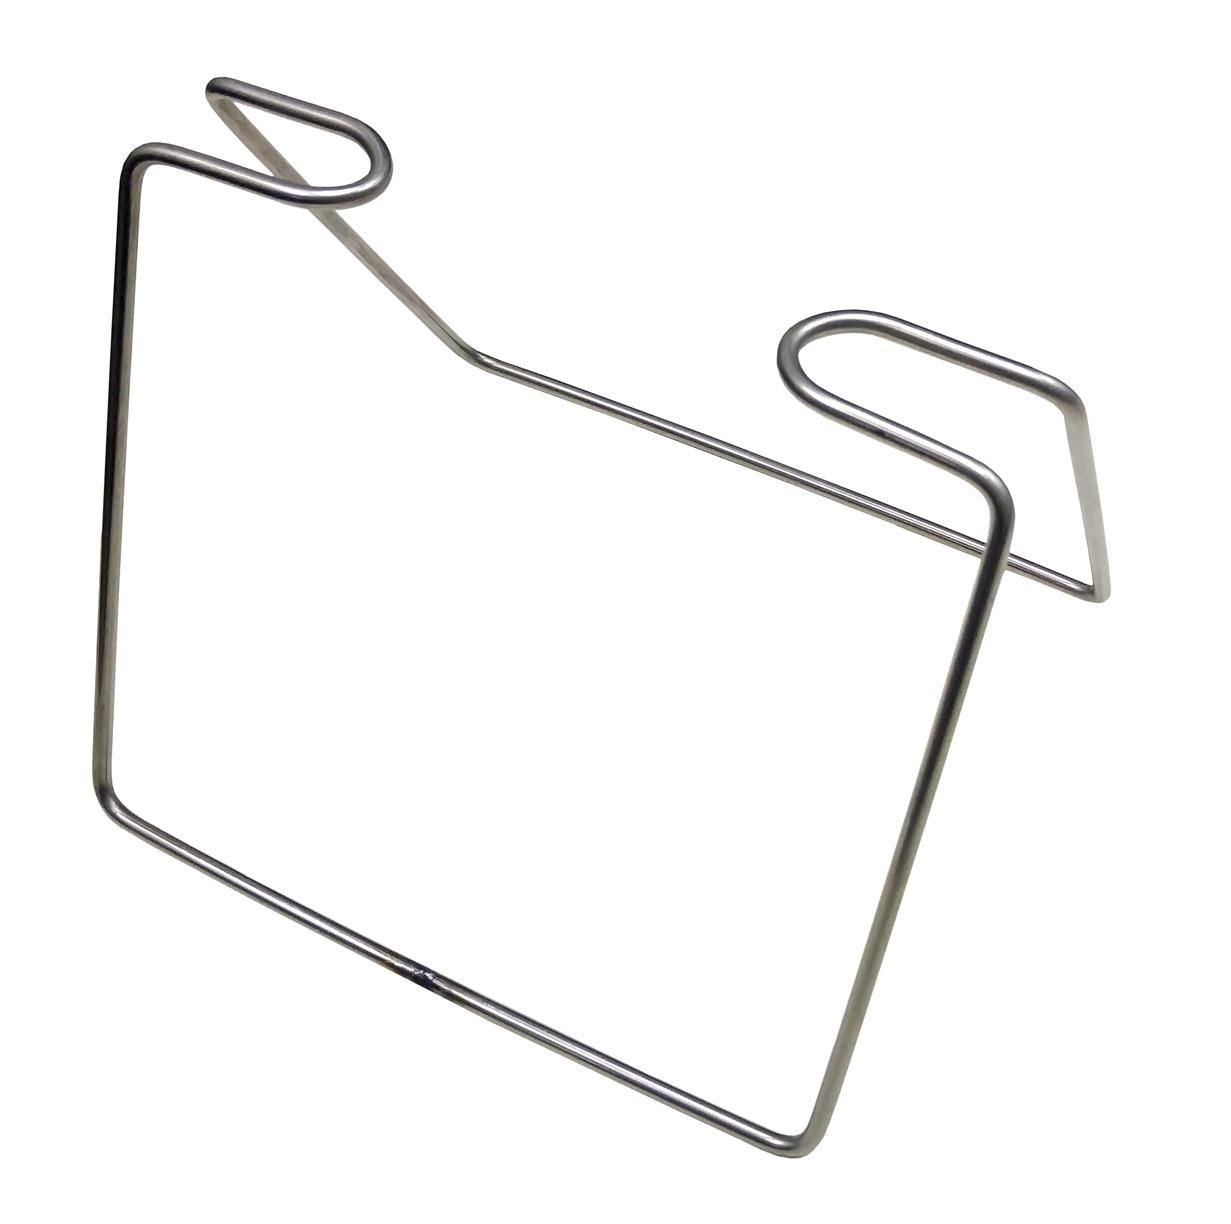 Metal Prep Towel Rack